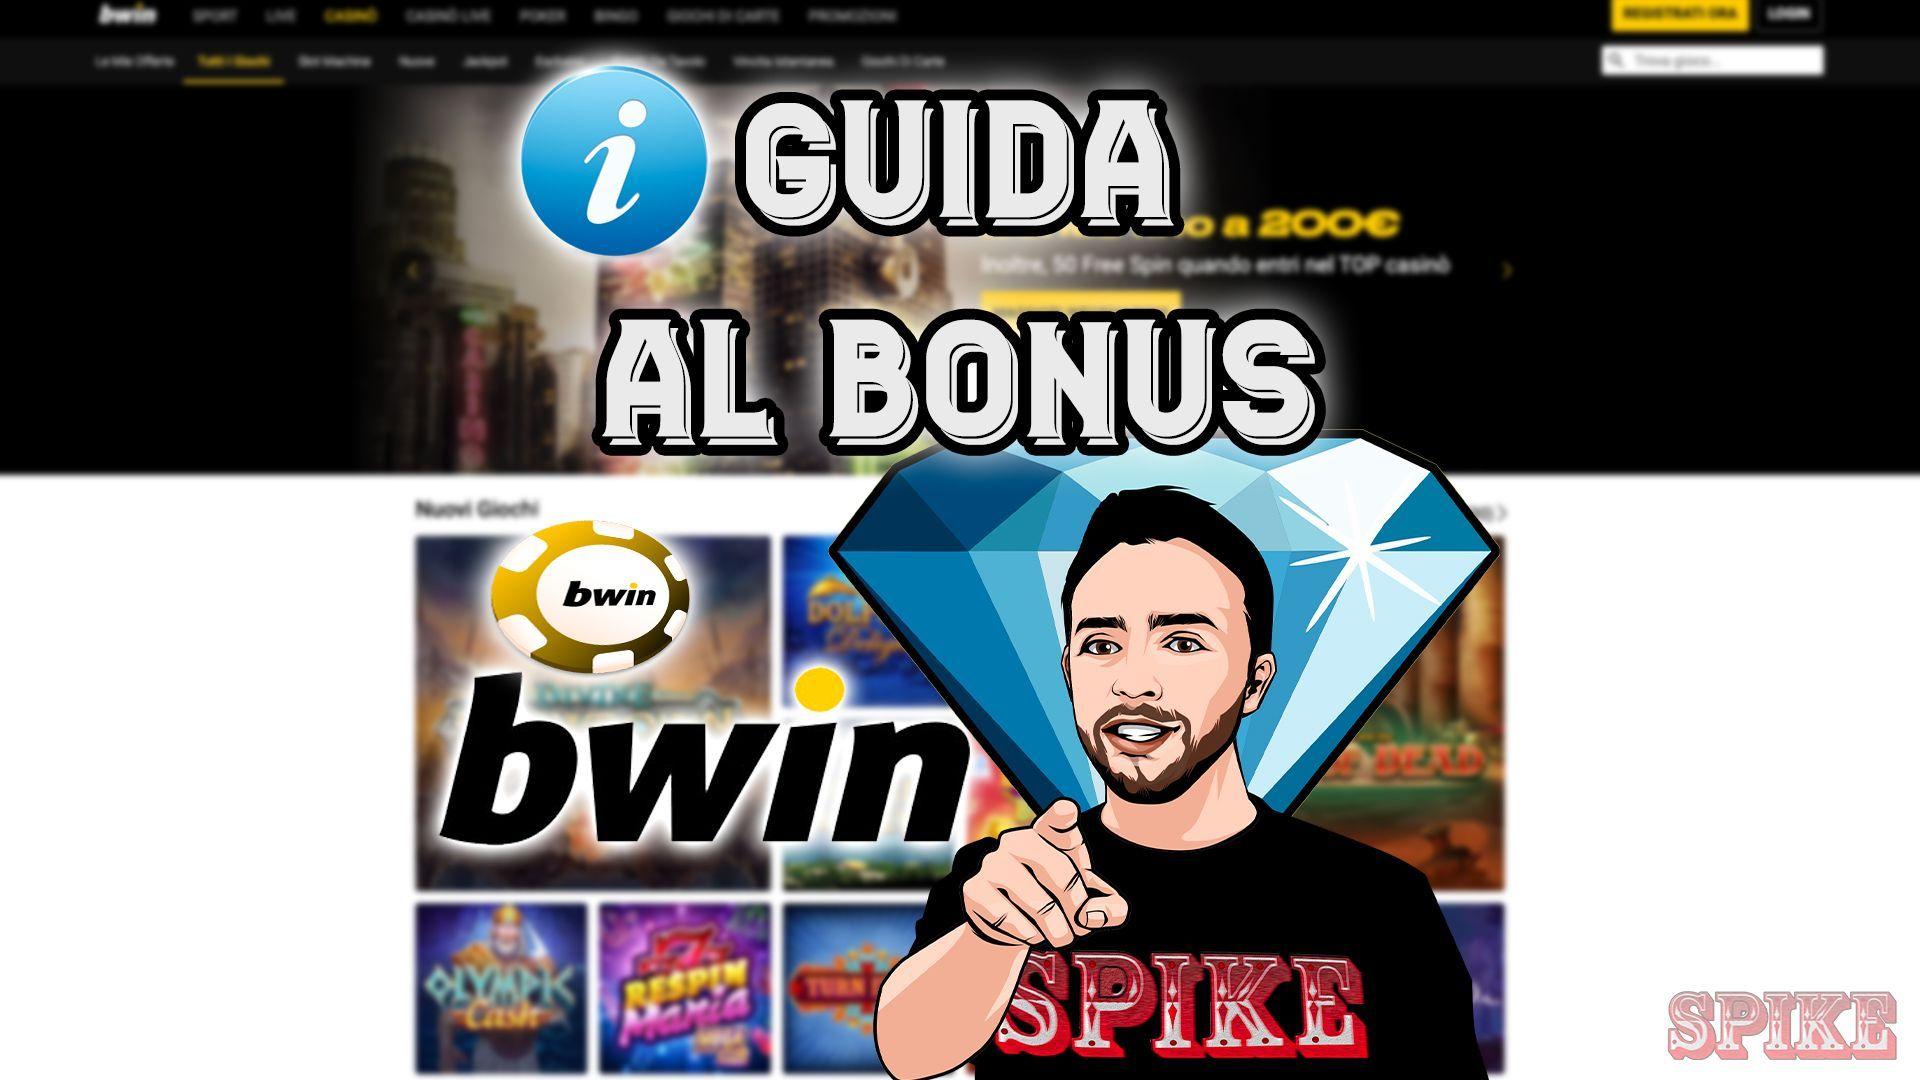 Guida Bwin Bonus Casino Logo